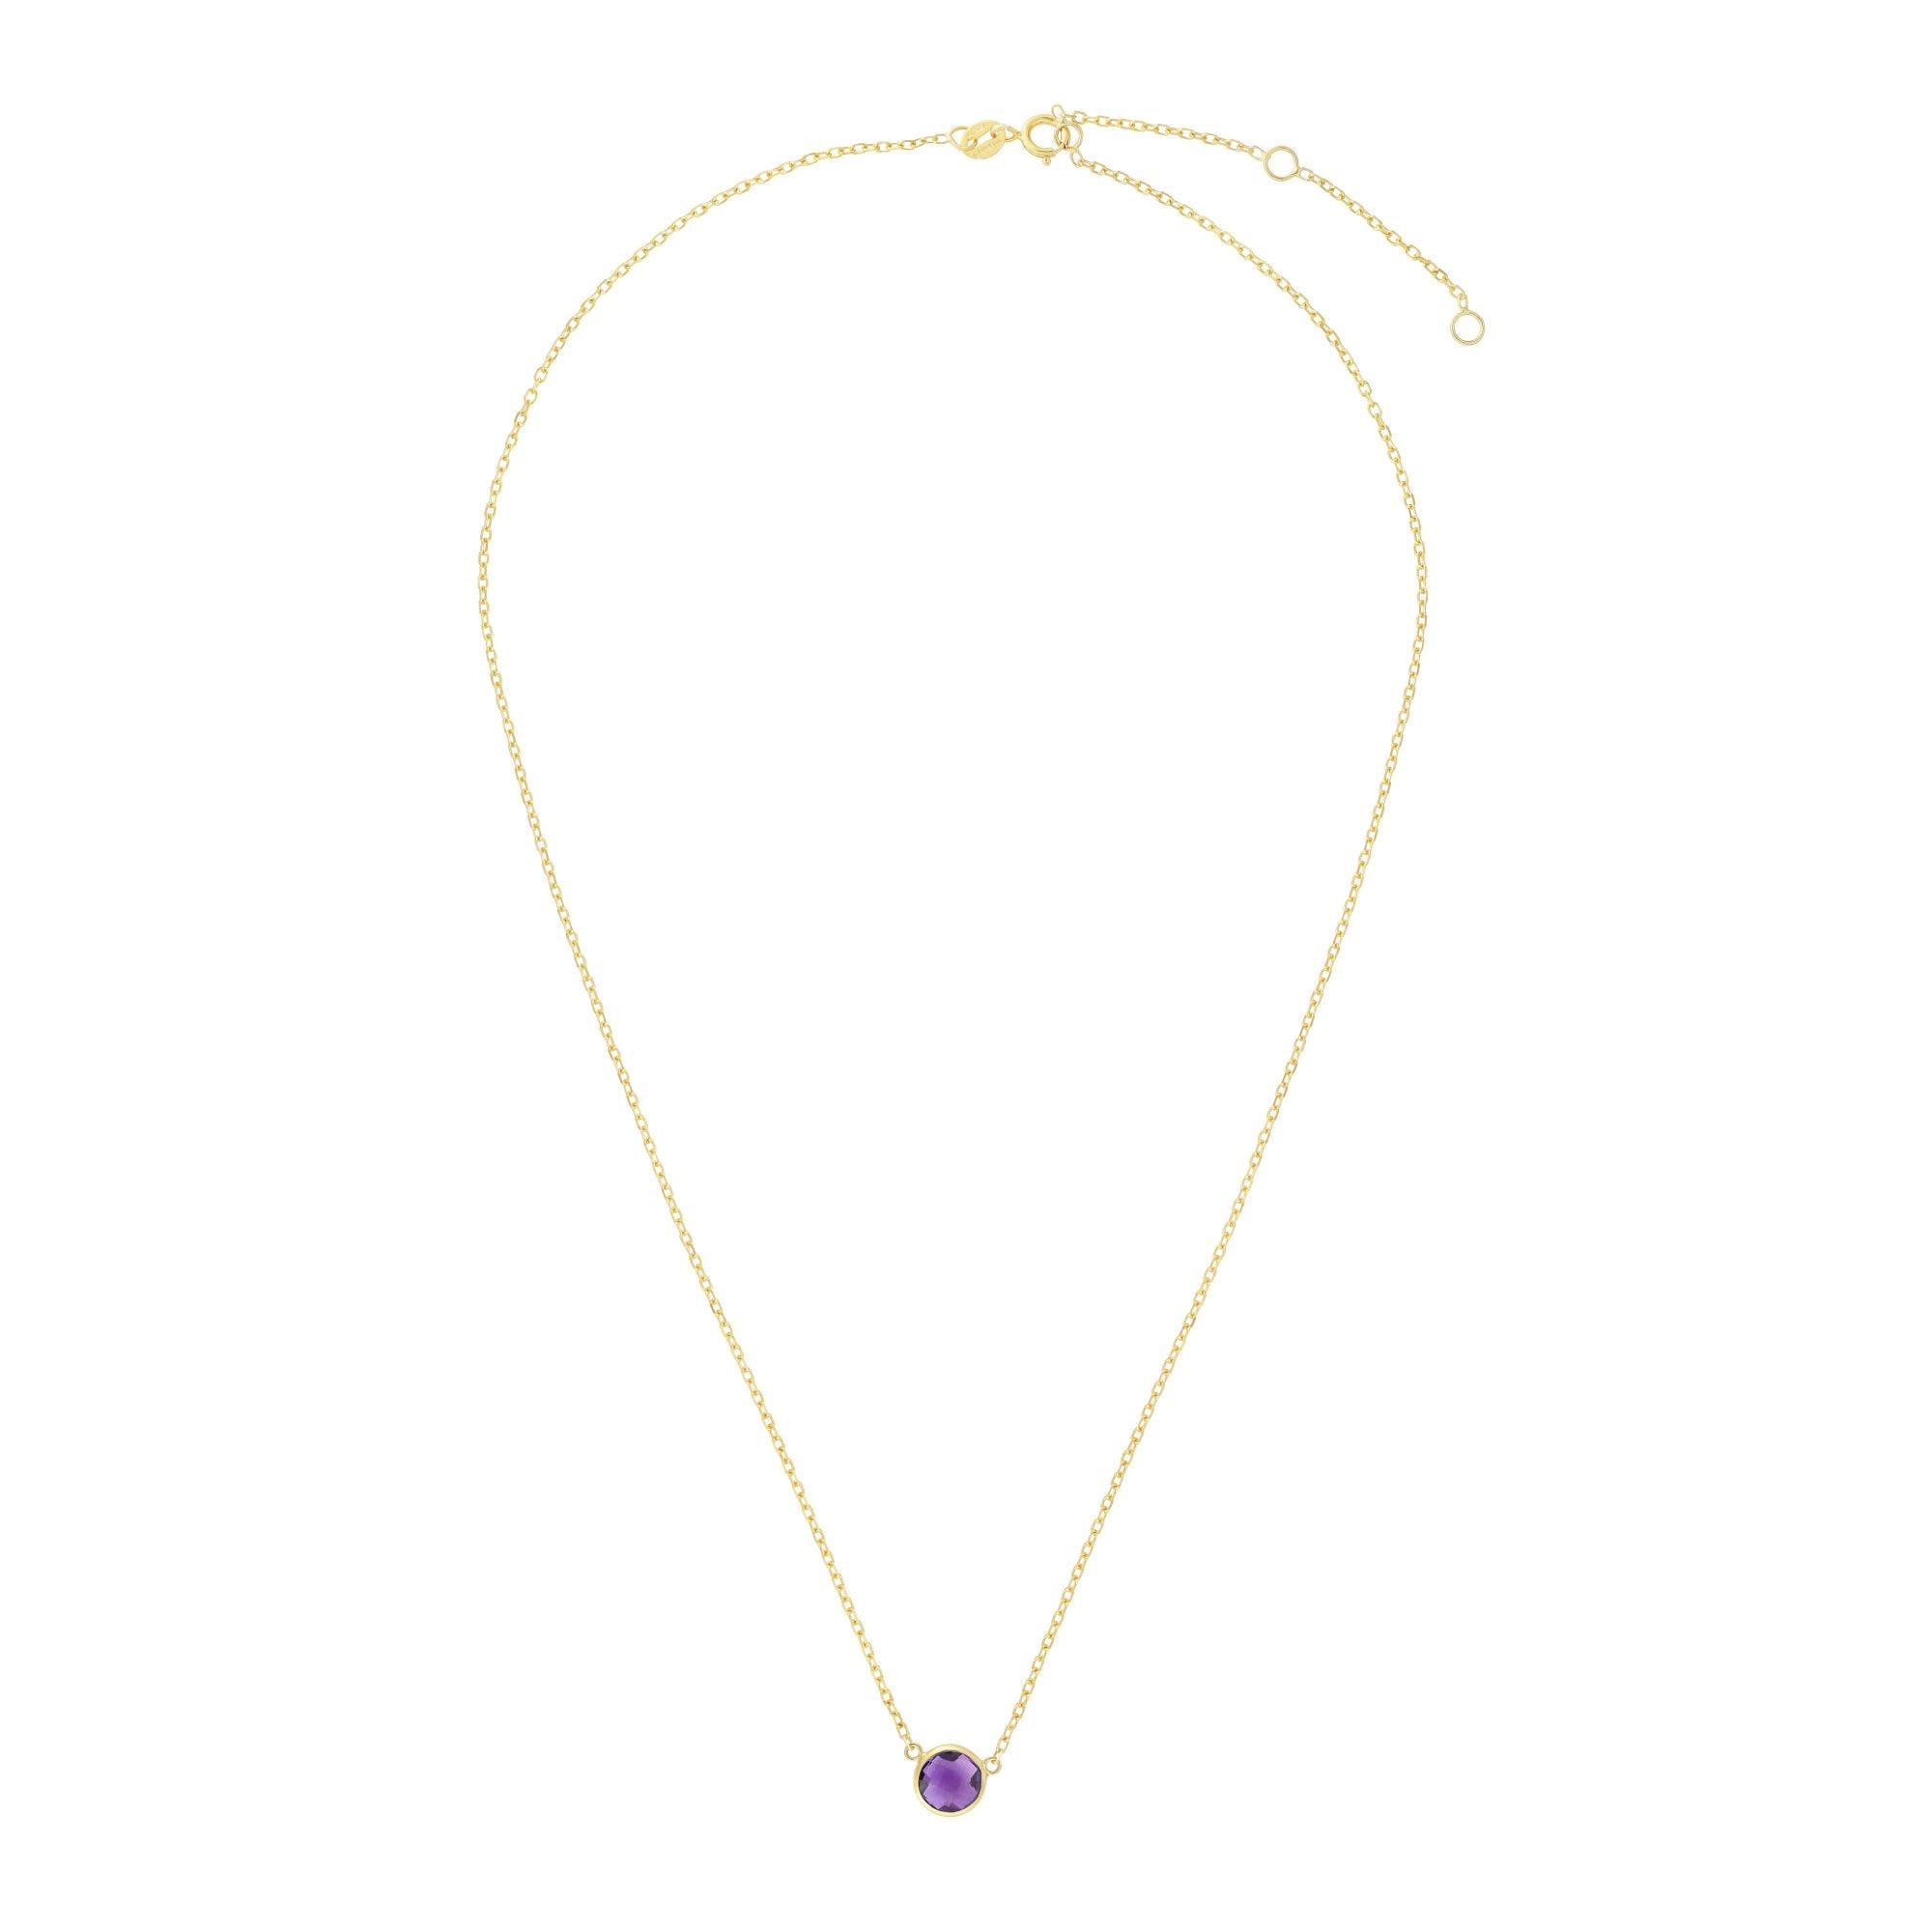 Amethyst Round Necklace 17